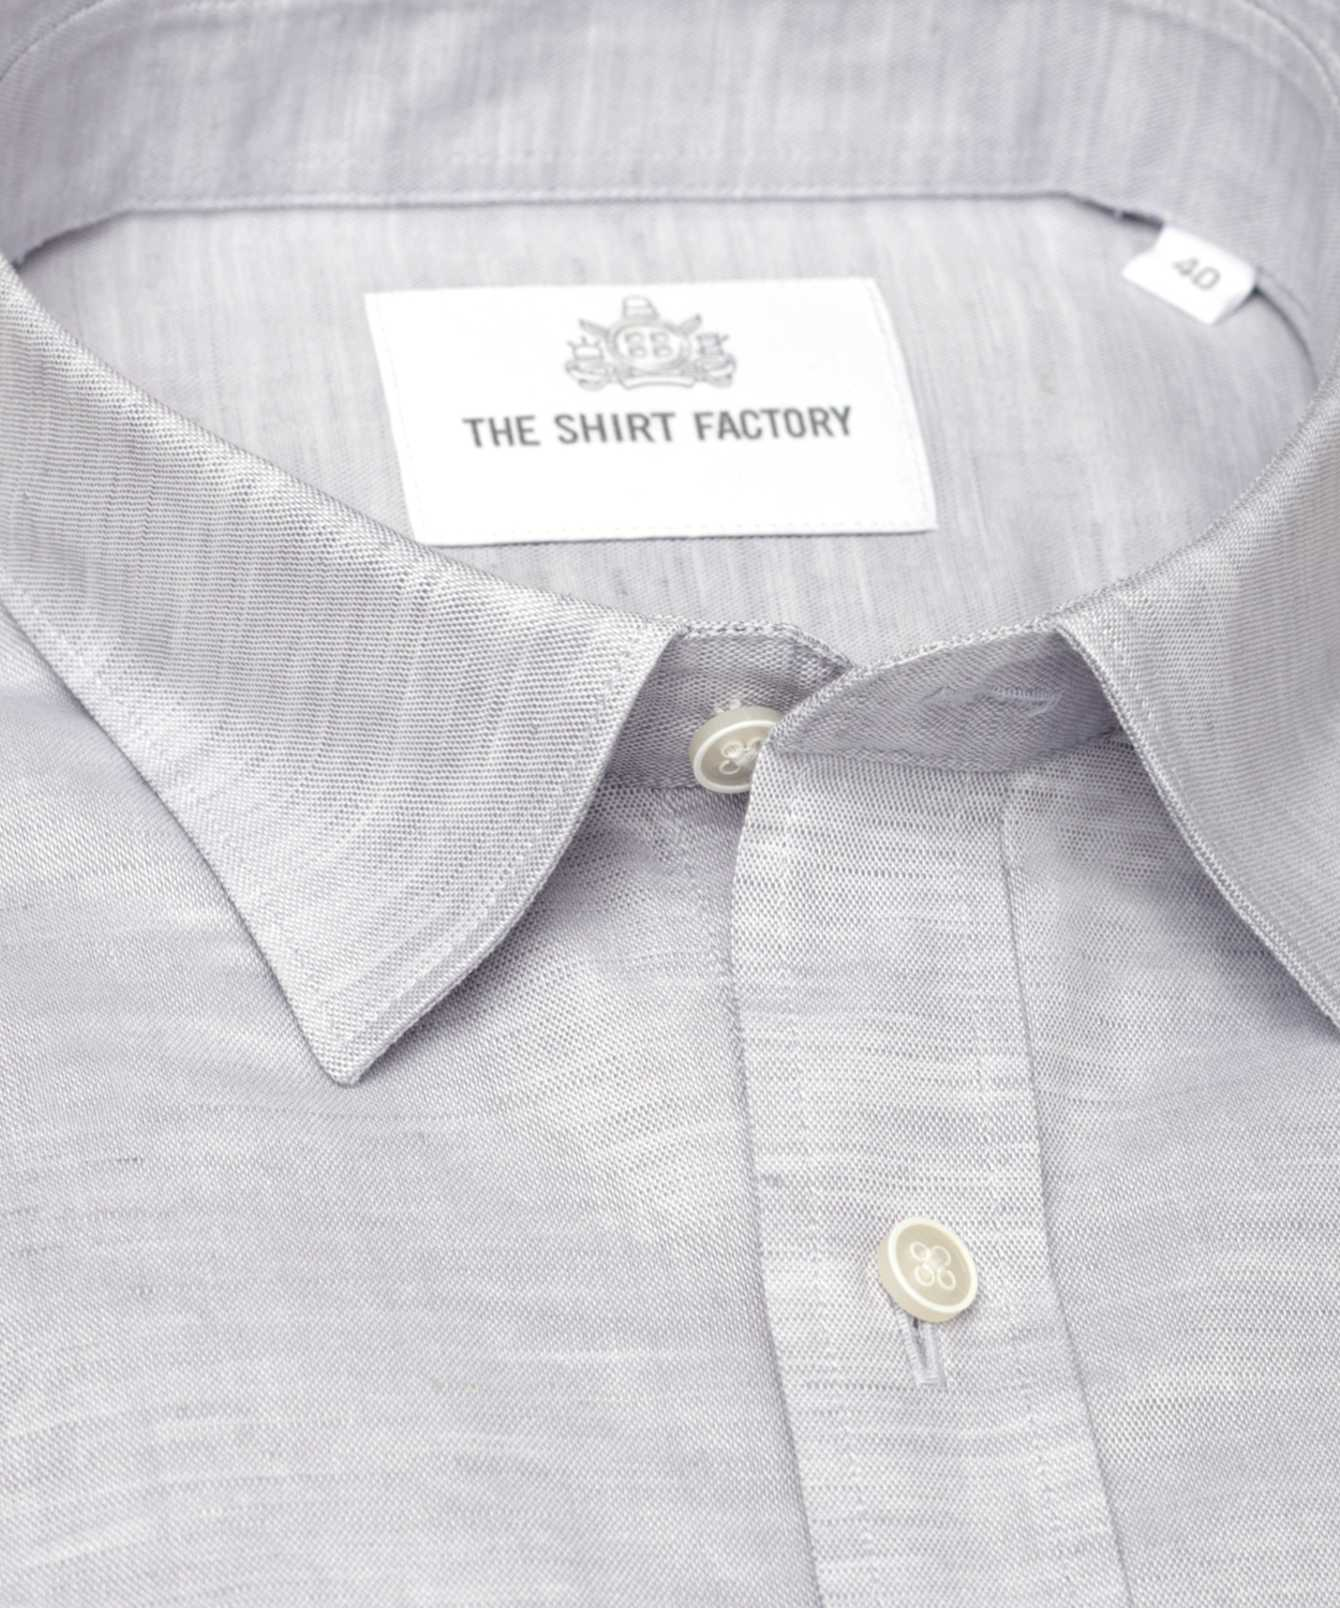 Shirt Delsbo Linne Grå kort ärm The Shirt Factory